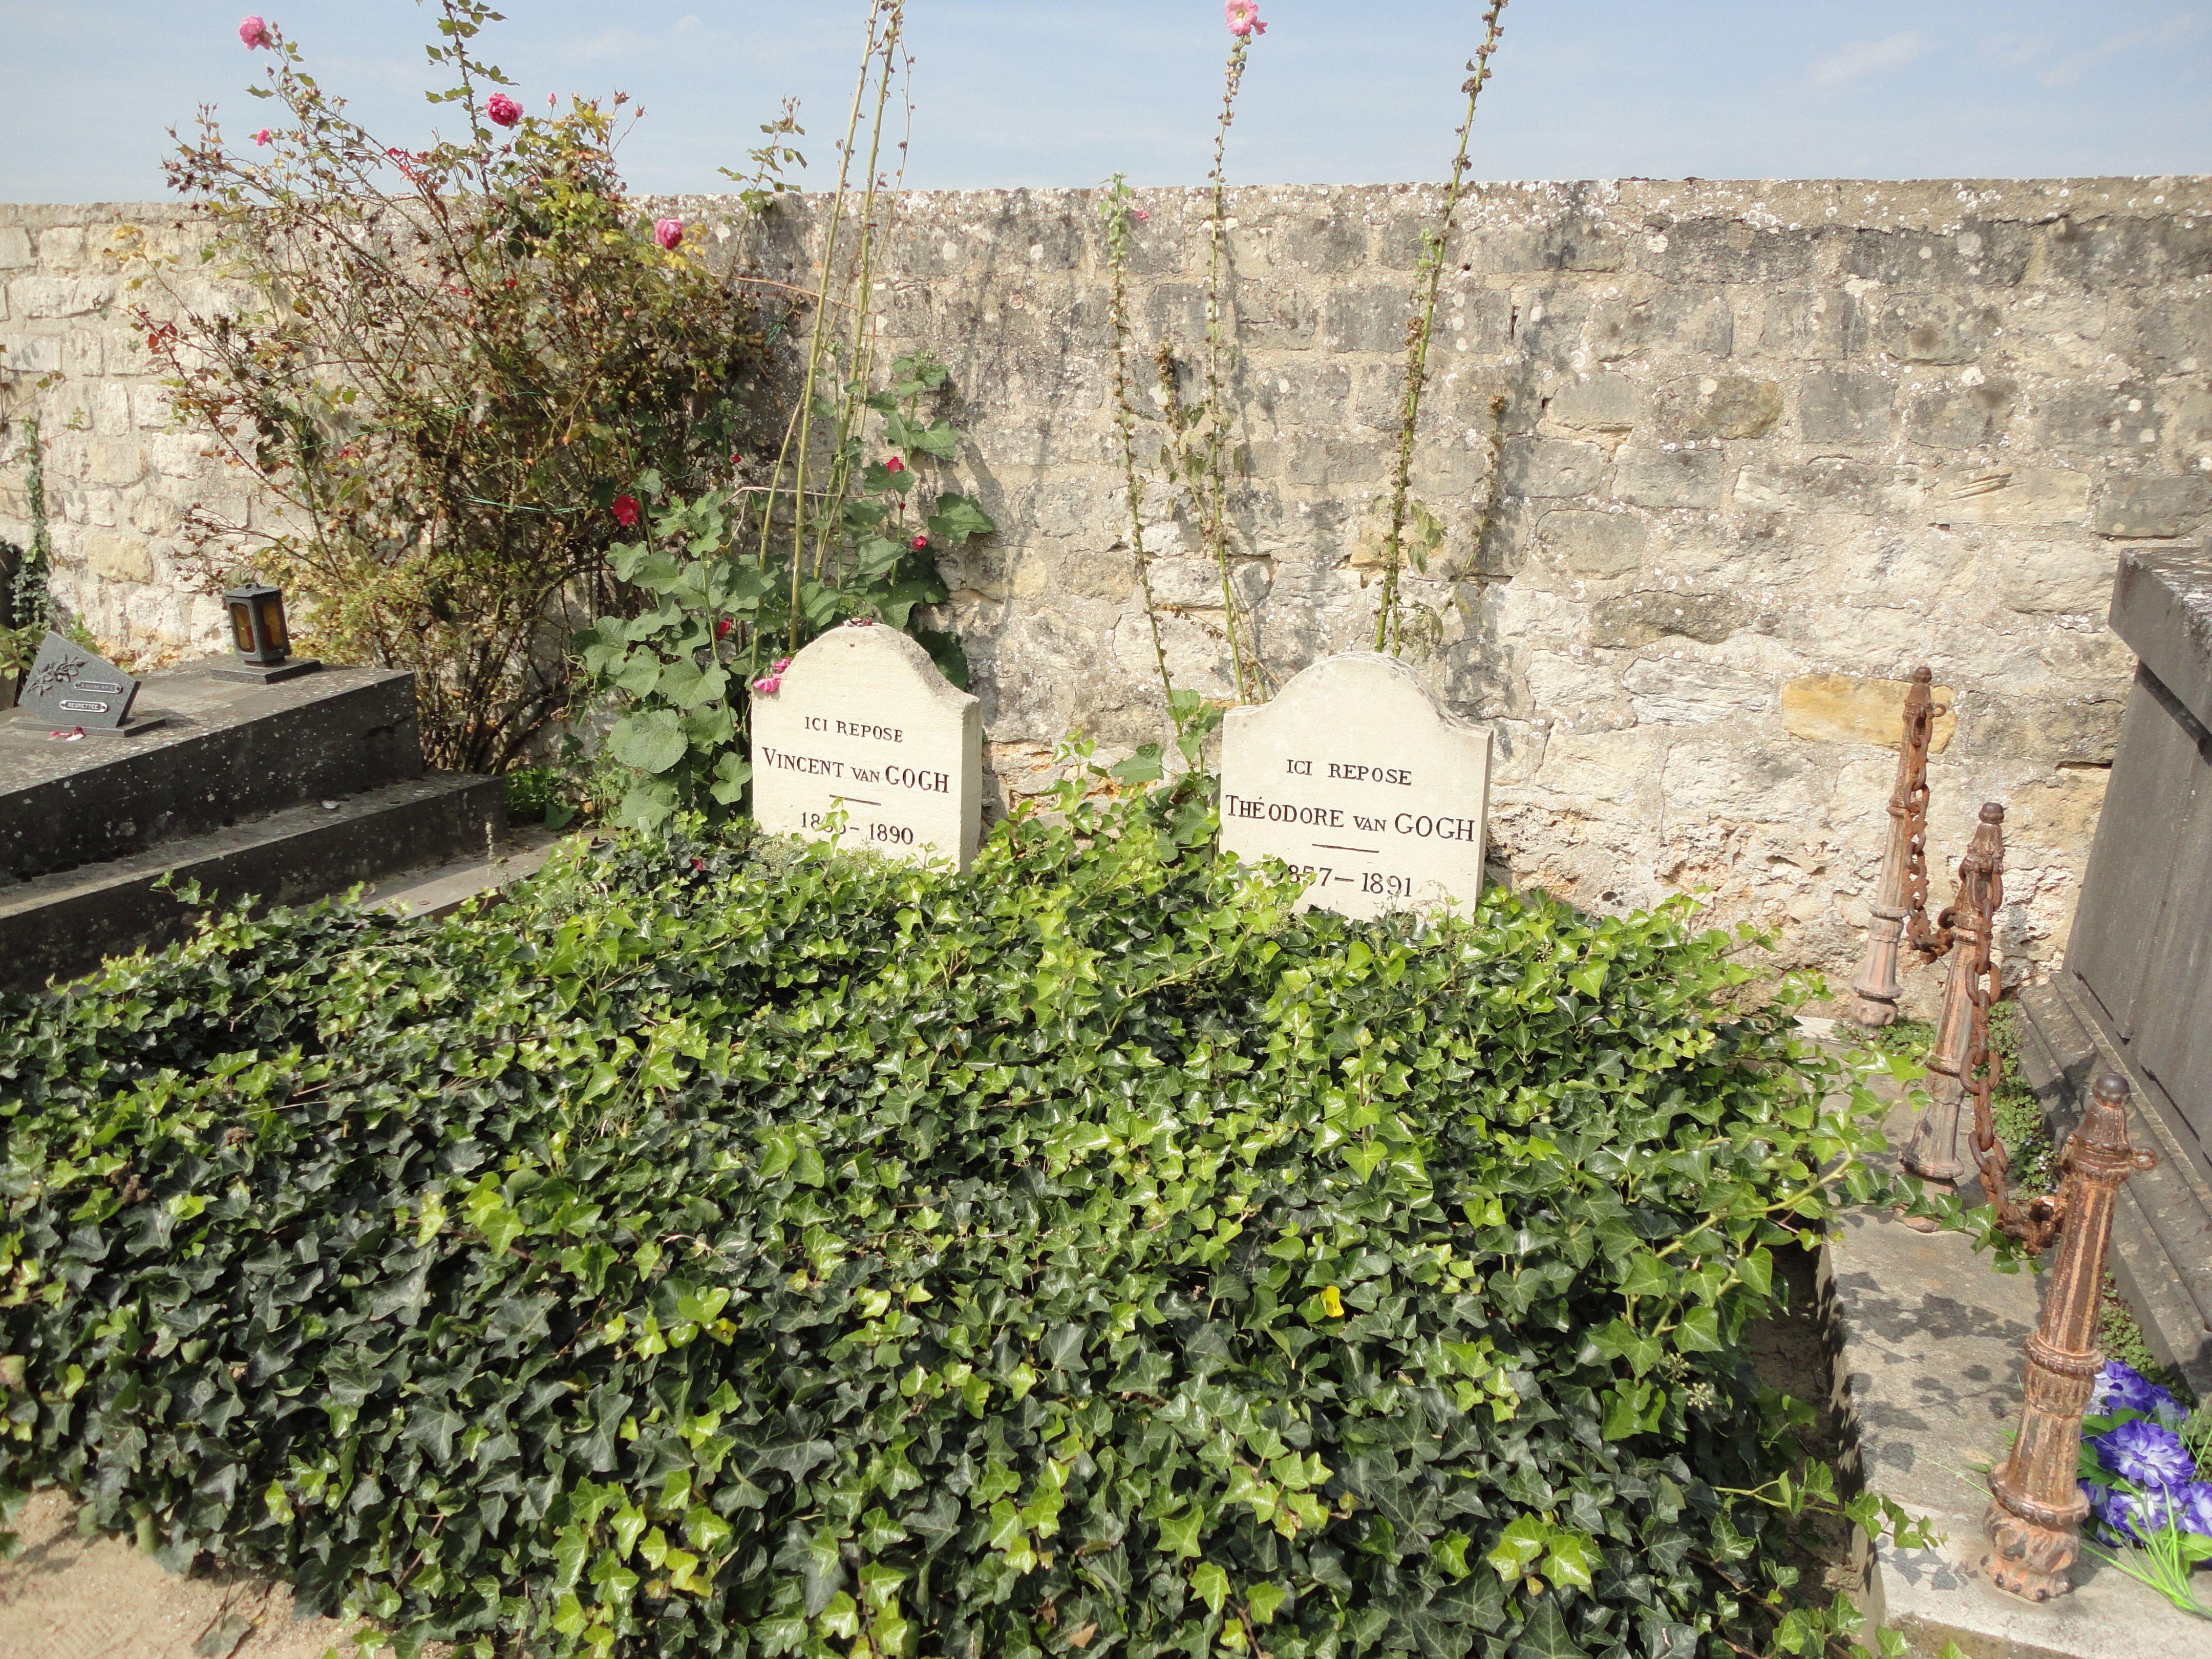 Vincent van Gogh (1853-1890) - Find A Grave